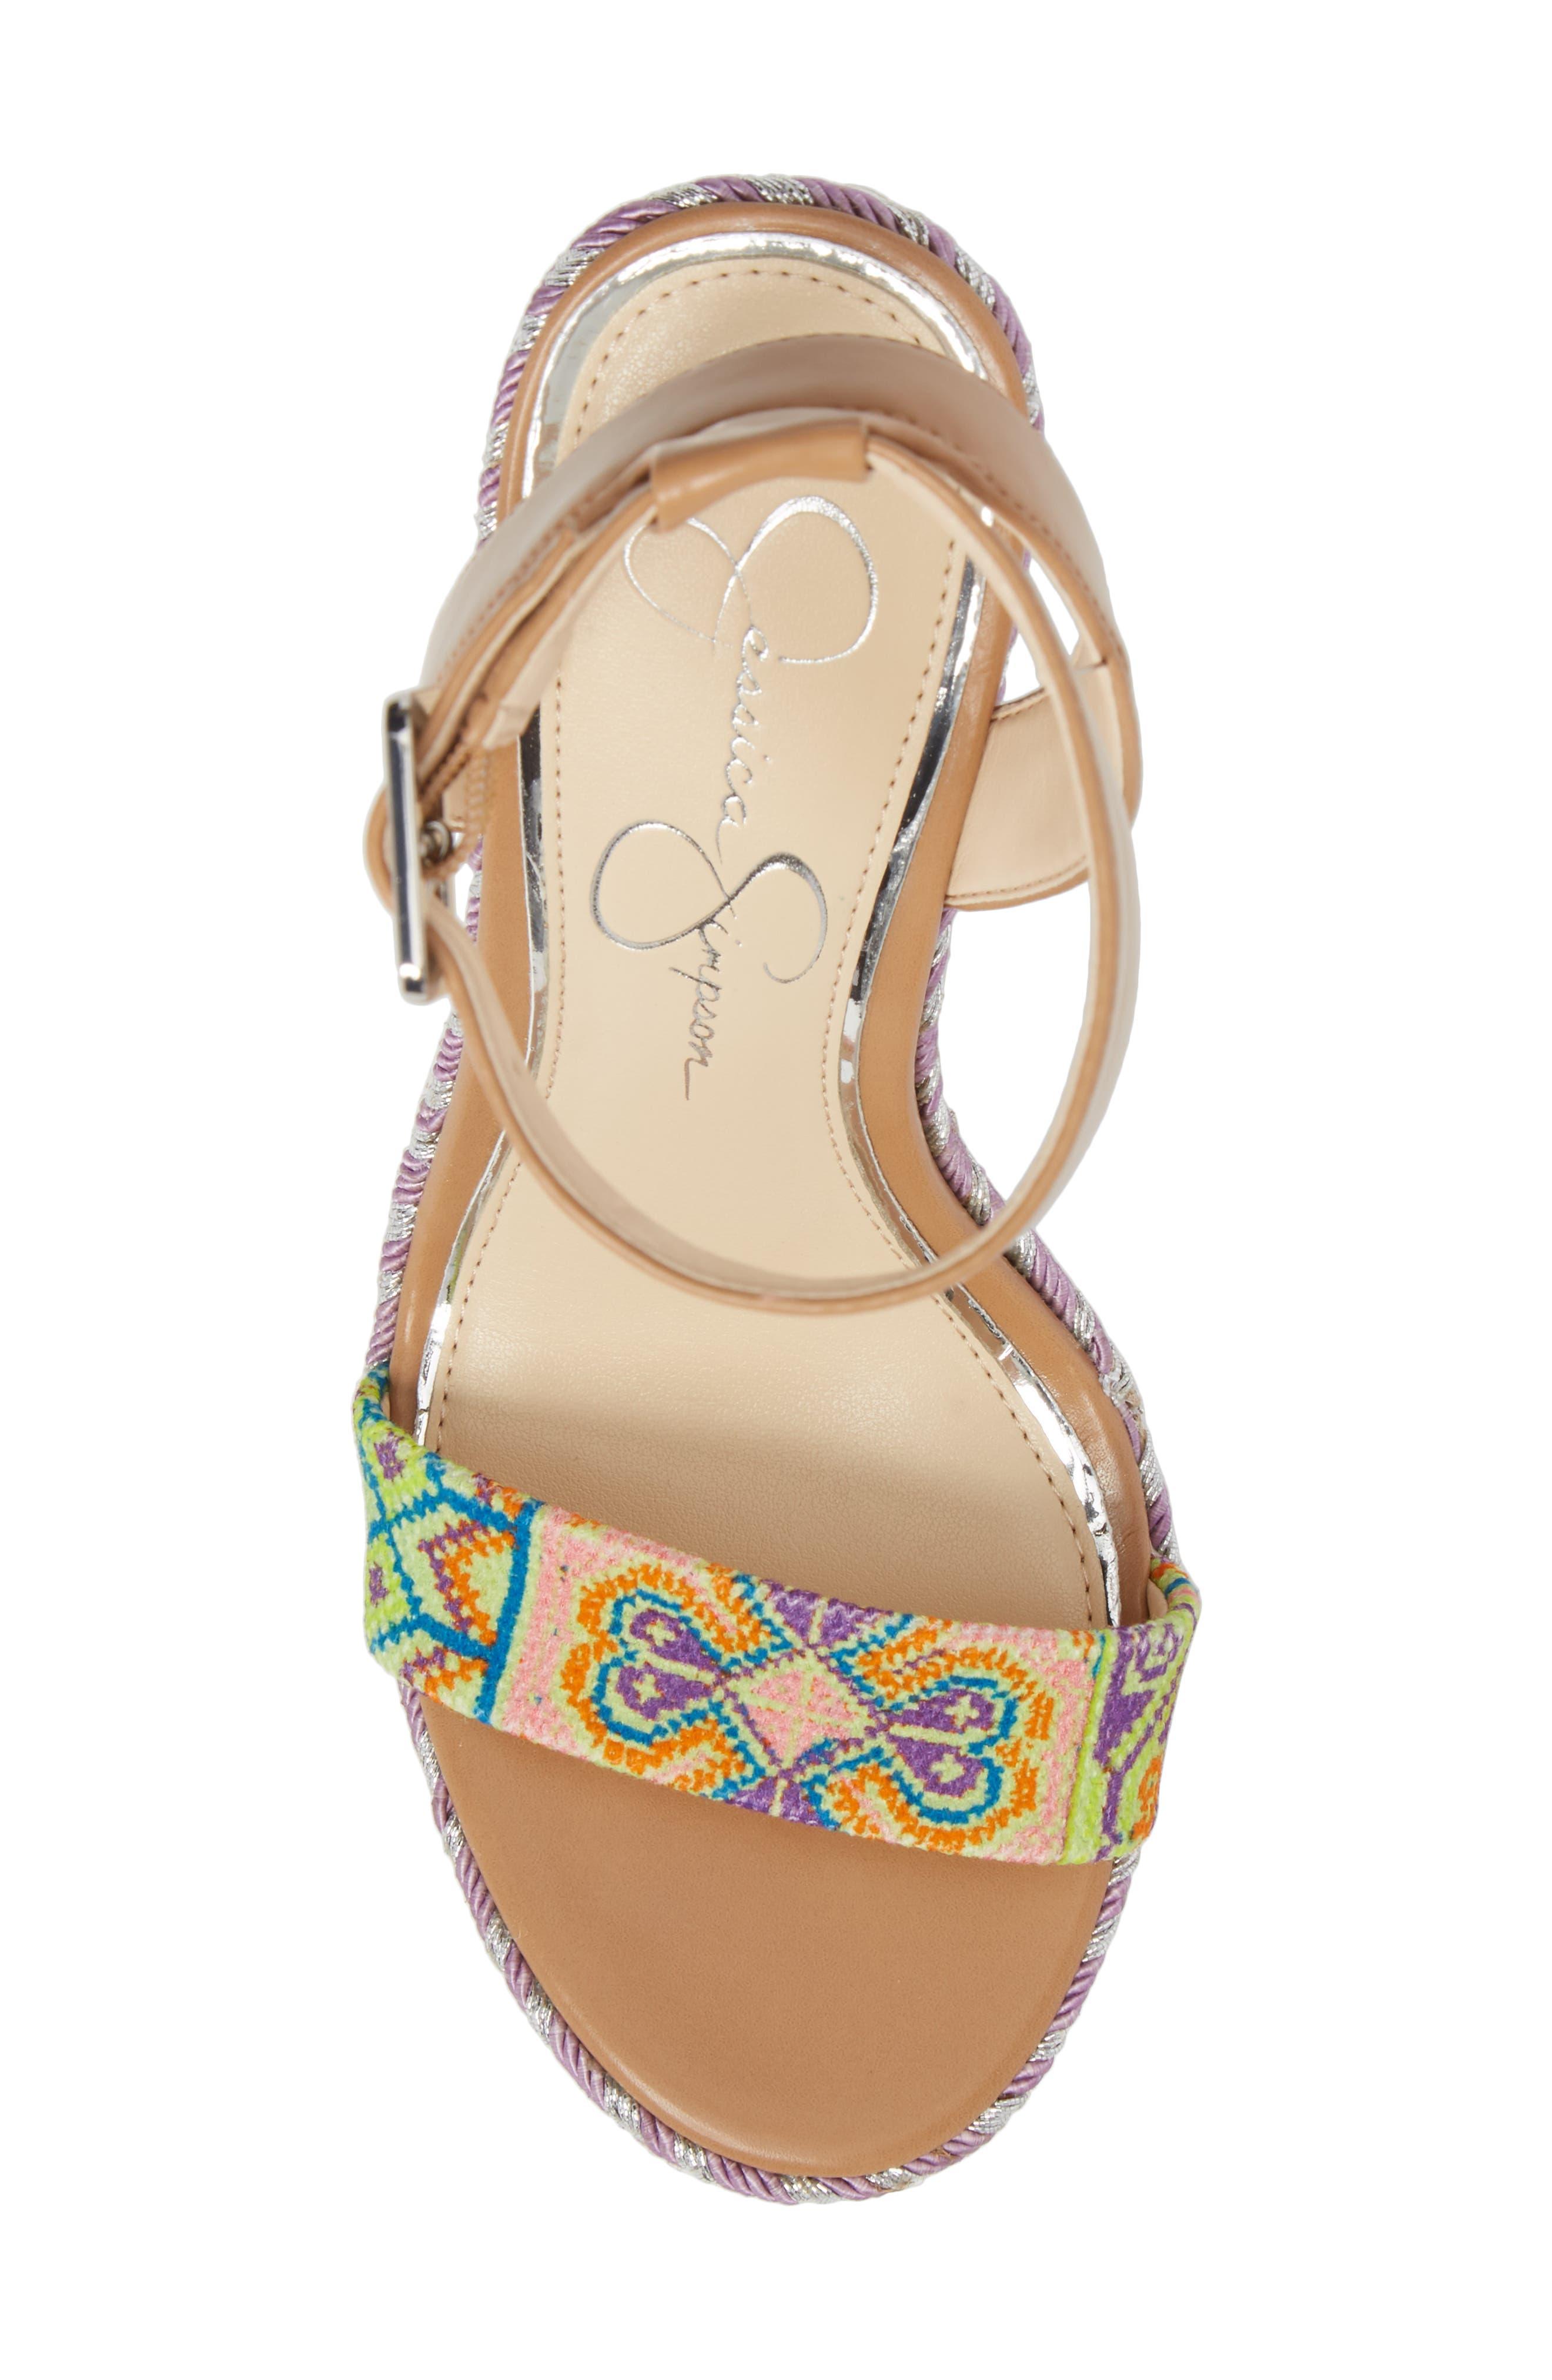 Alinda Embellished Wedge Sandal,                             Alternate thumbnail 5, color,                             320